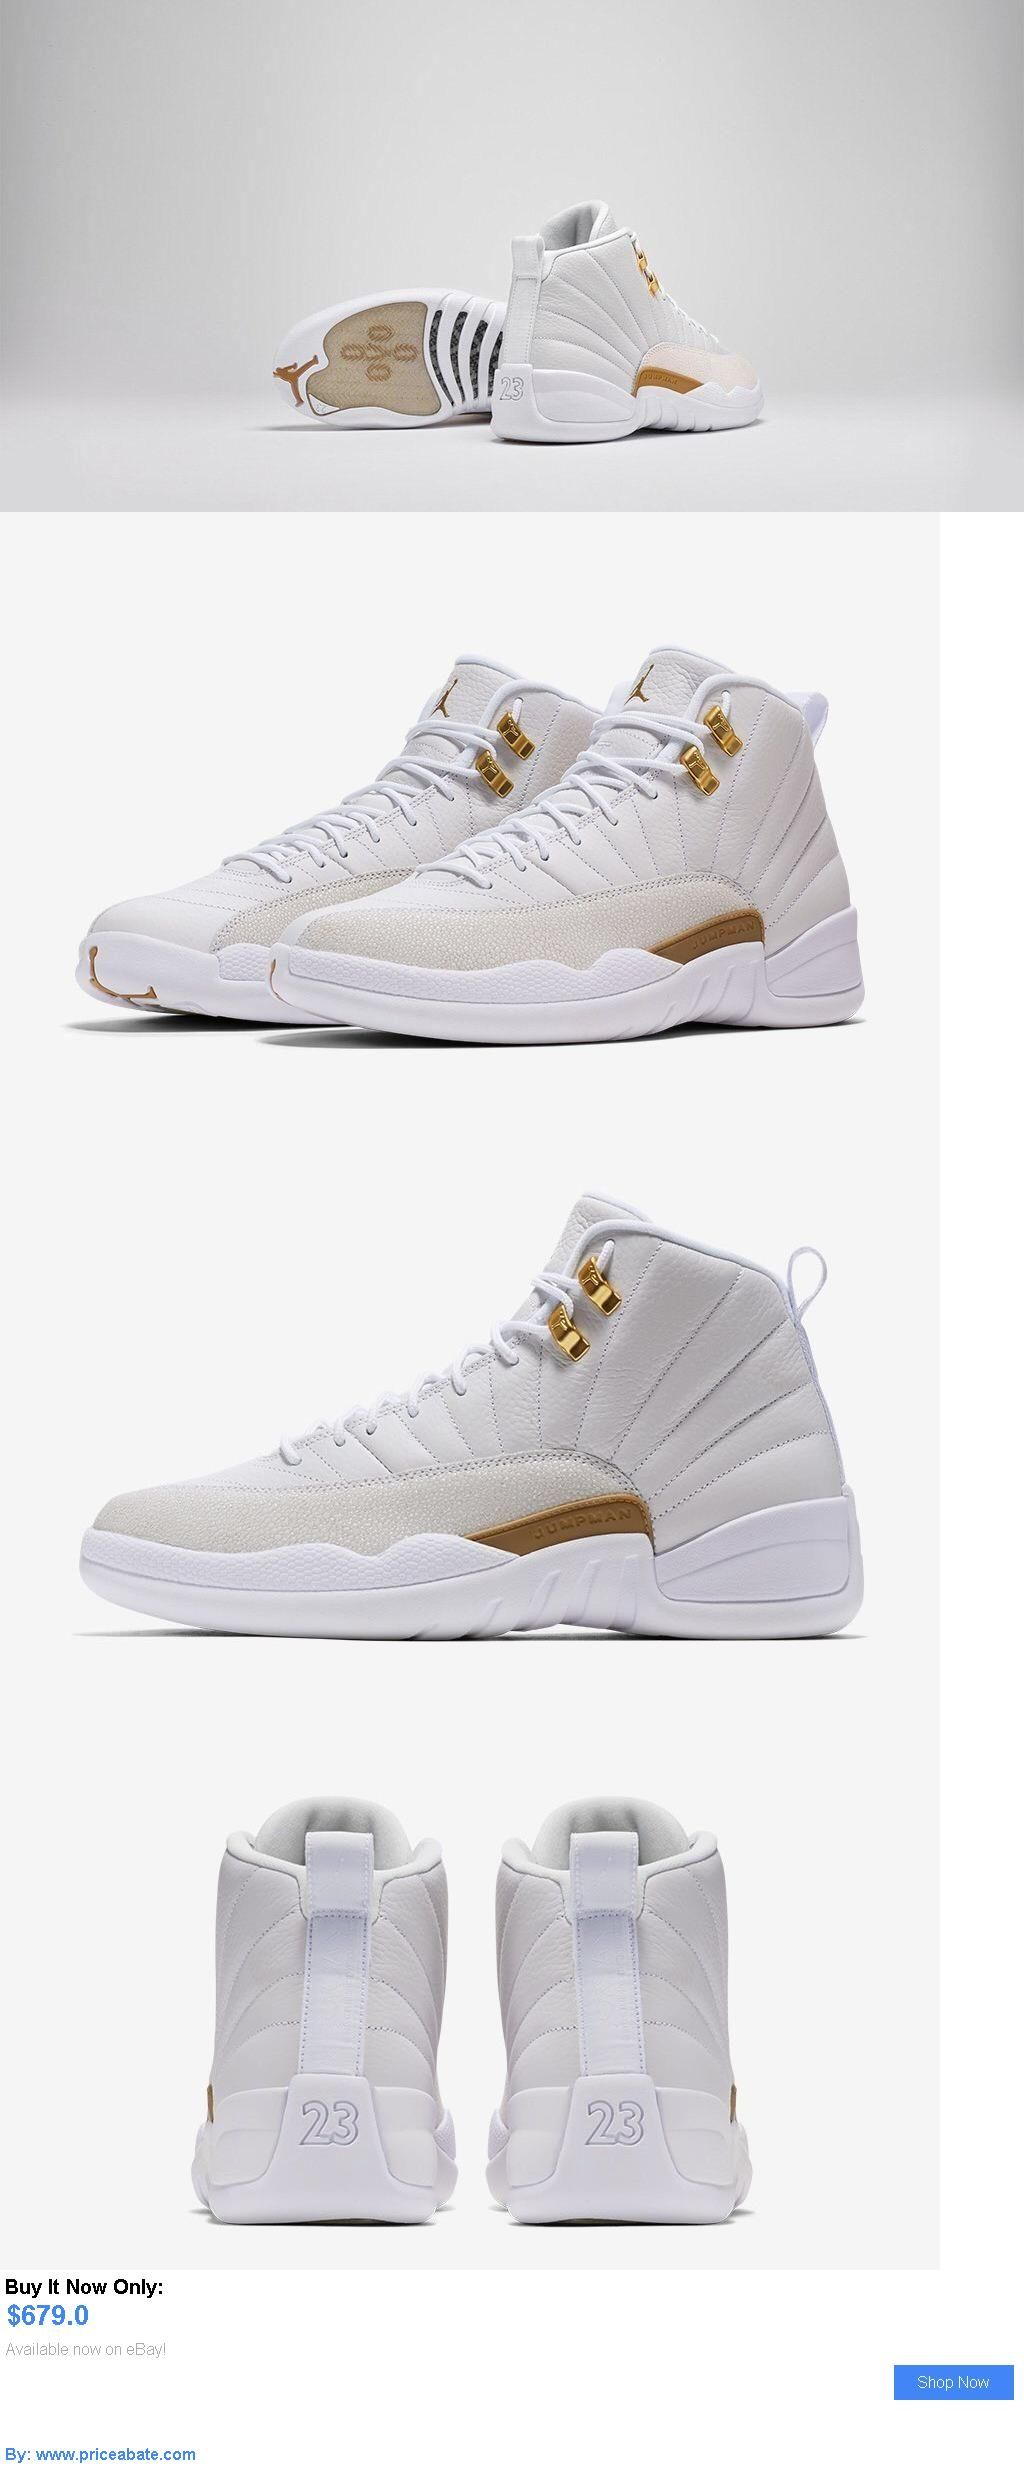 0b8c0bb0ee5 Men Shoes  Nike Air Jordan 12 X11 Ovo White Drake 2016 Mens Us Size 8 New  BUY IT NOW ONLY   679.0  priceabateMenShoes OR  priceabate